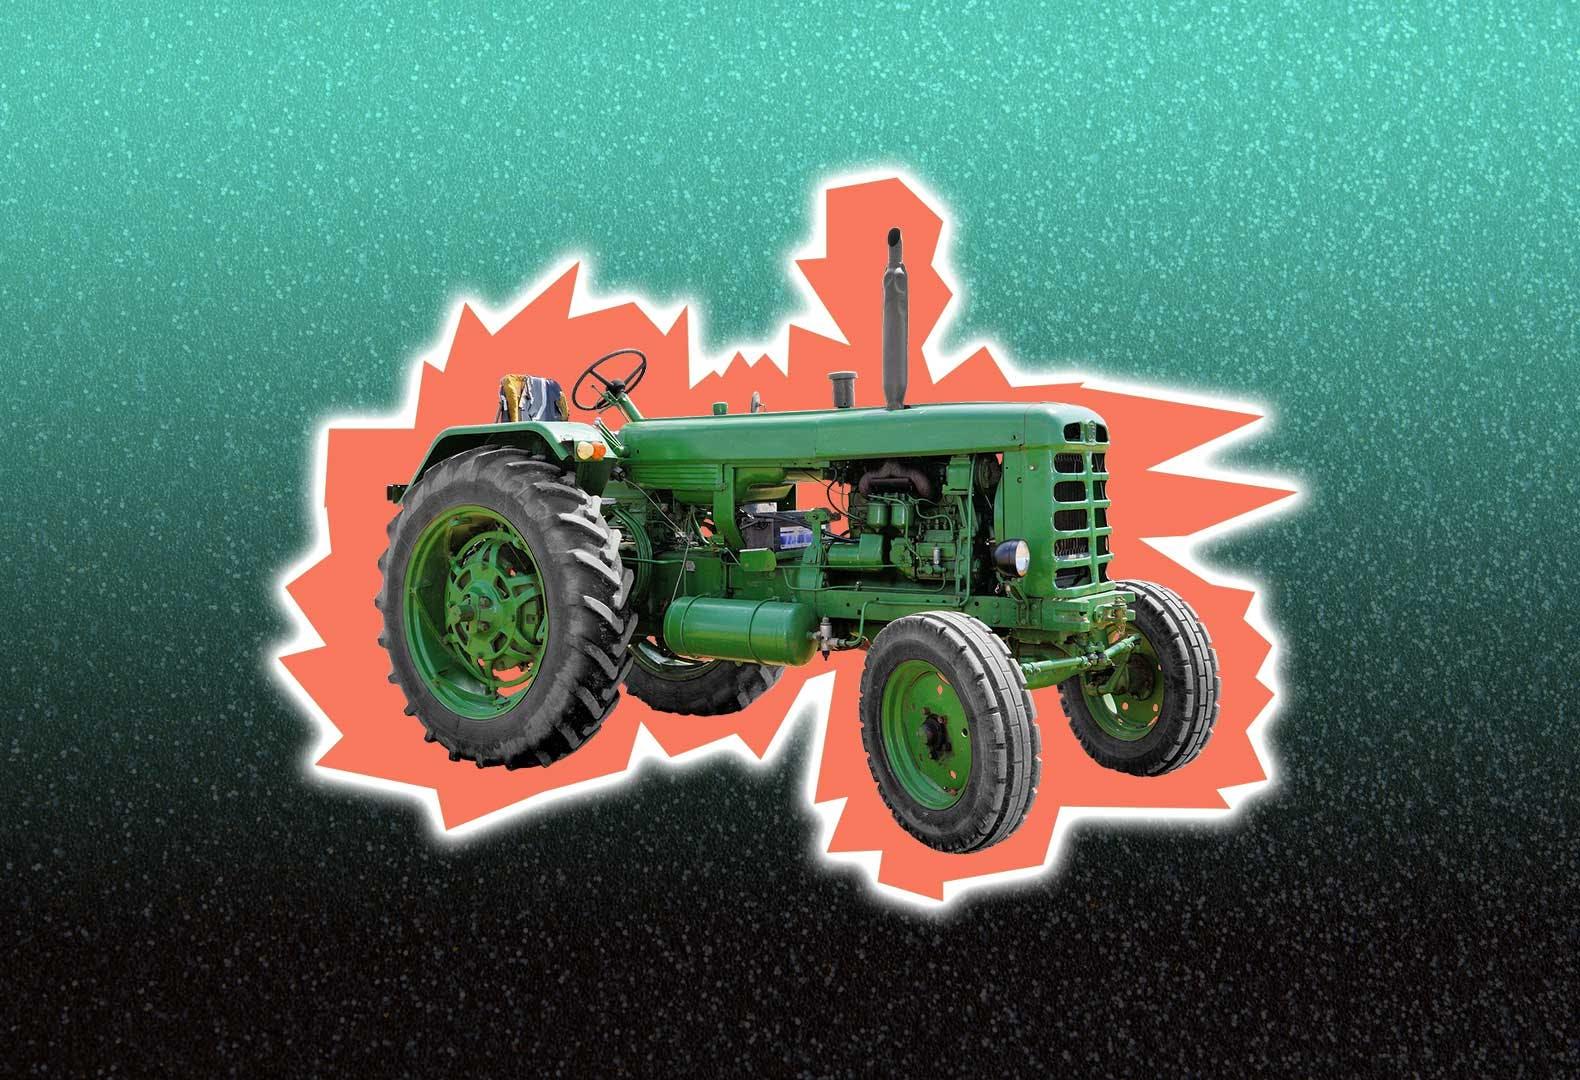 Magic tractor joke